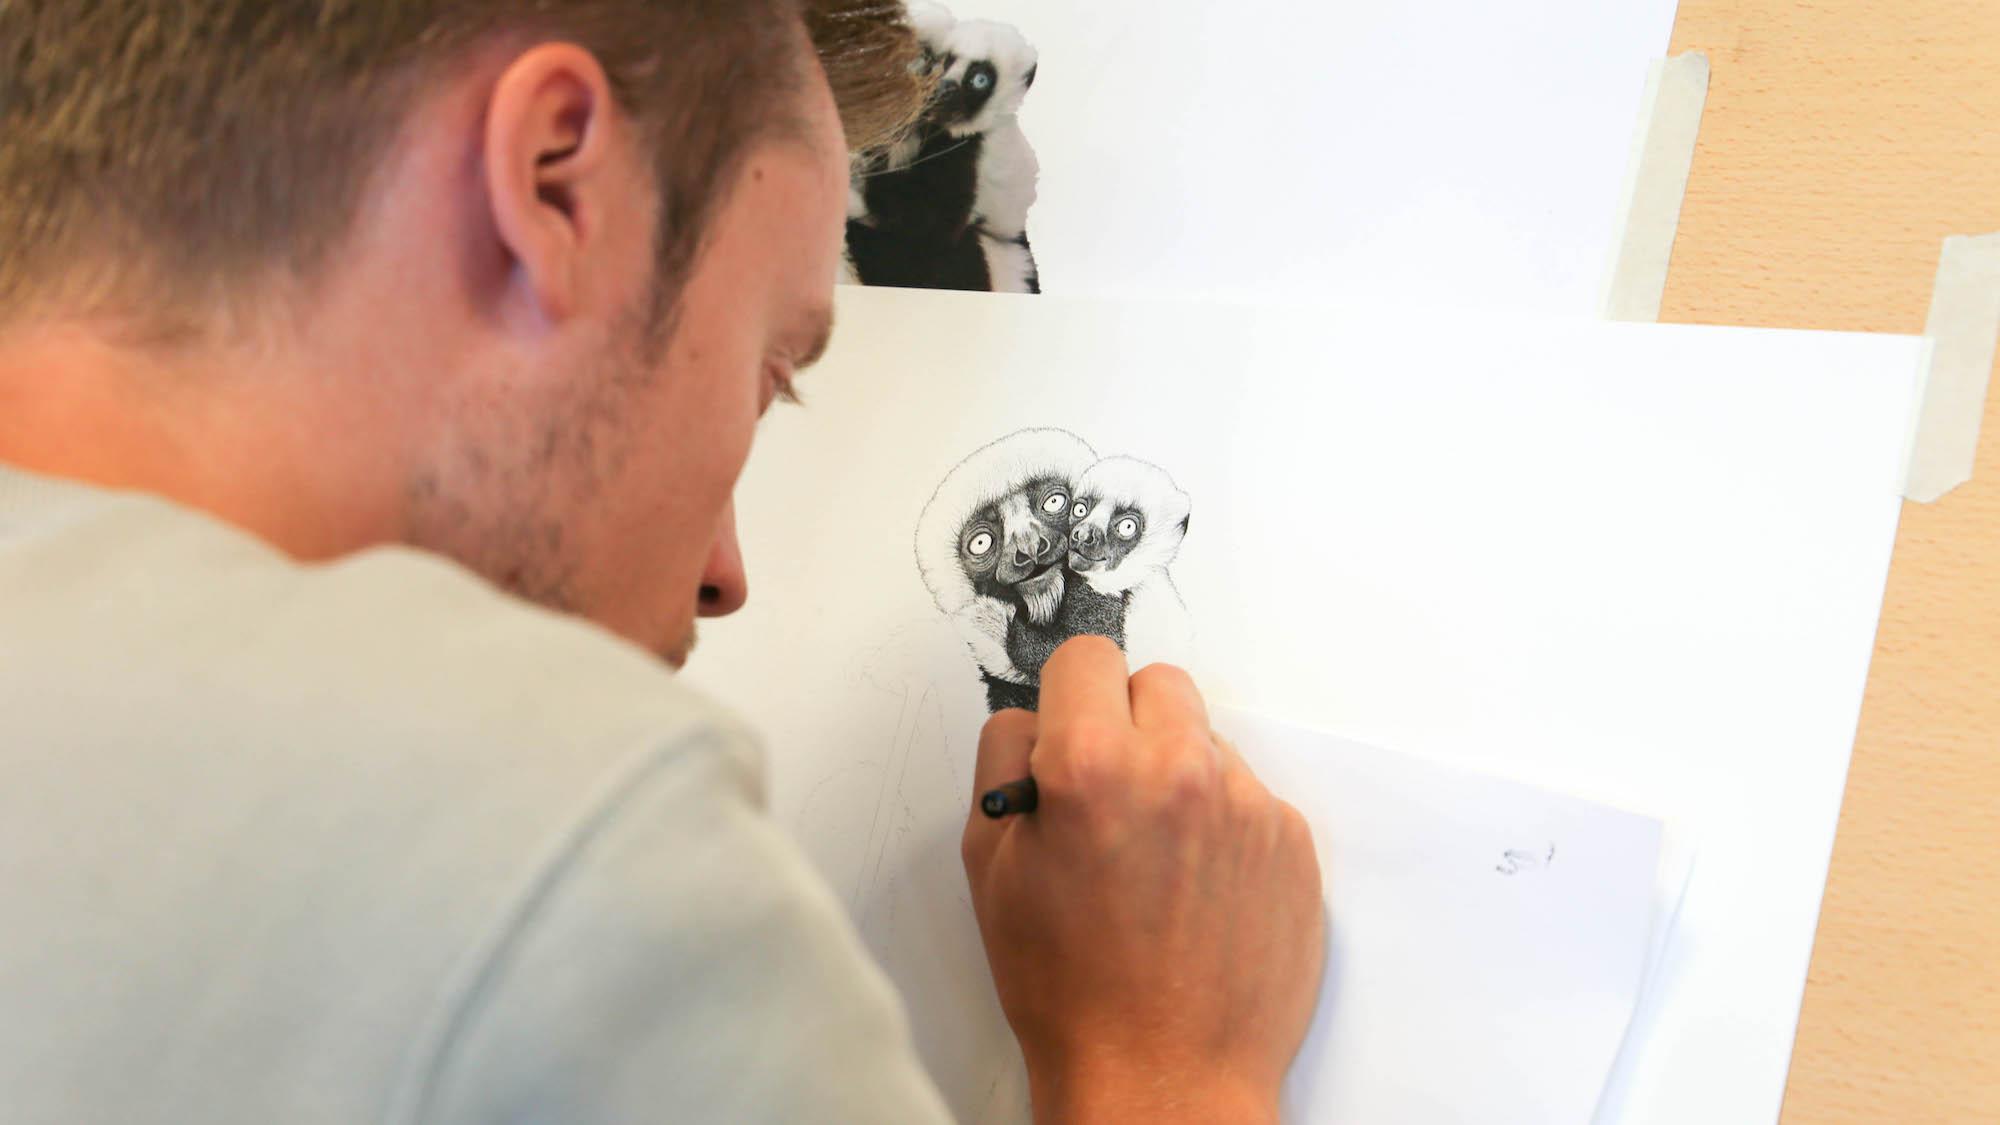 Illustrator Ferdy Remijn